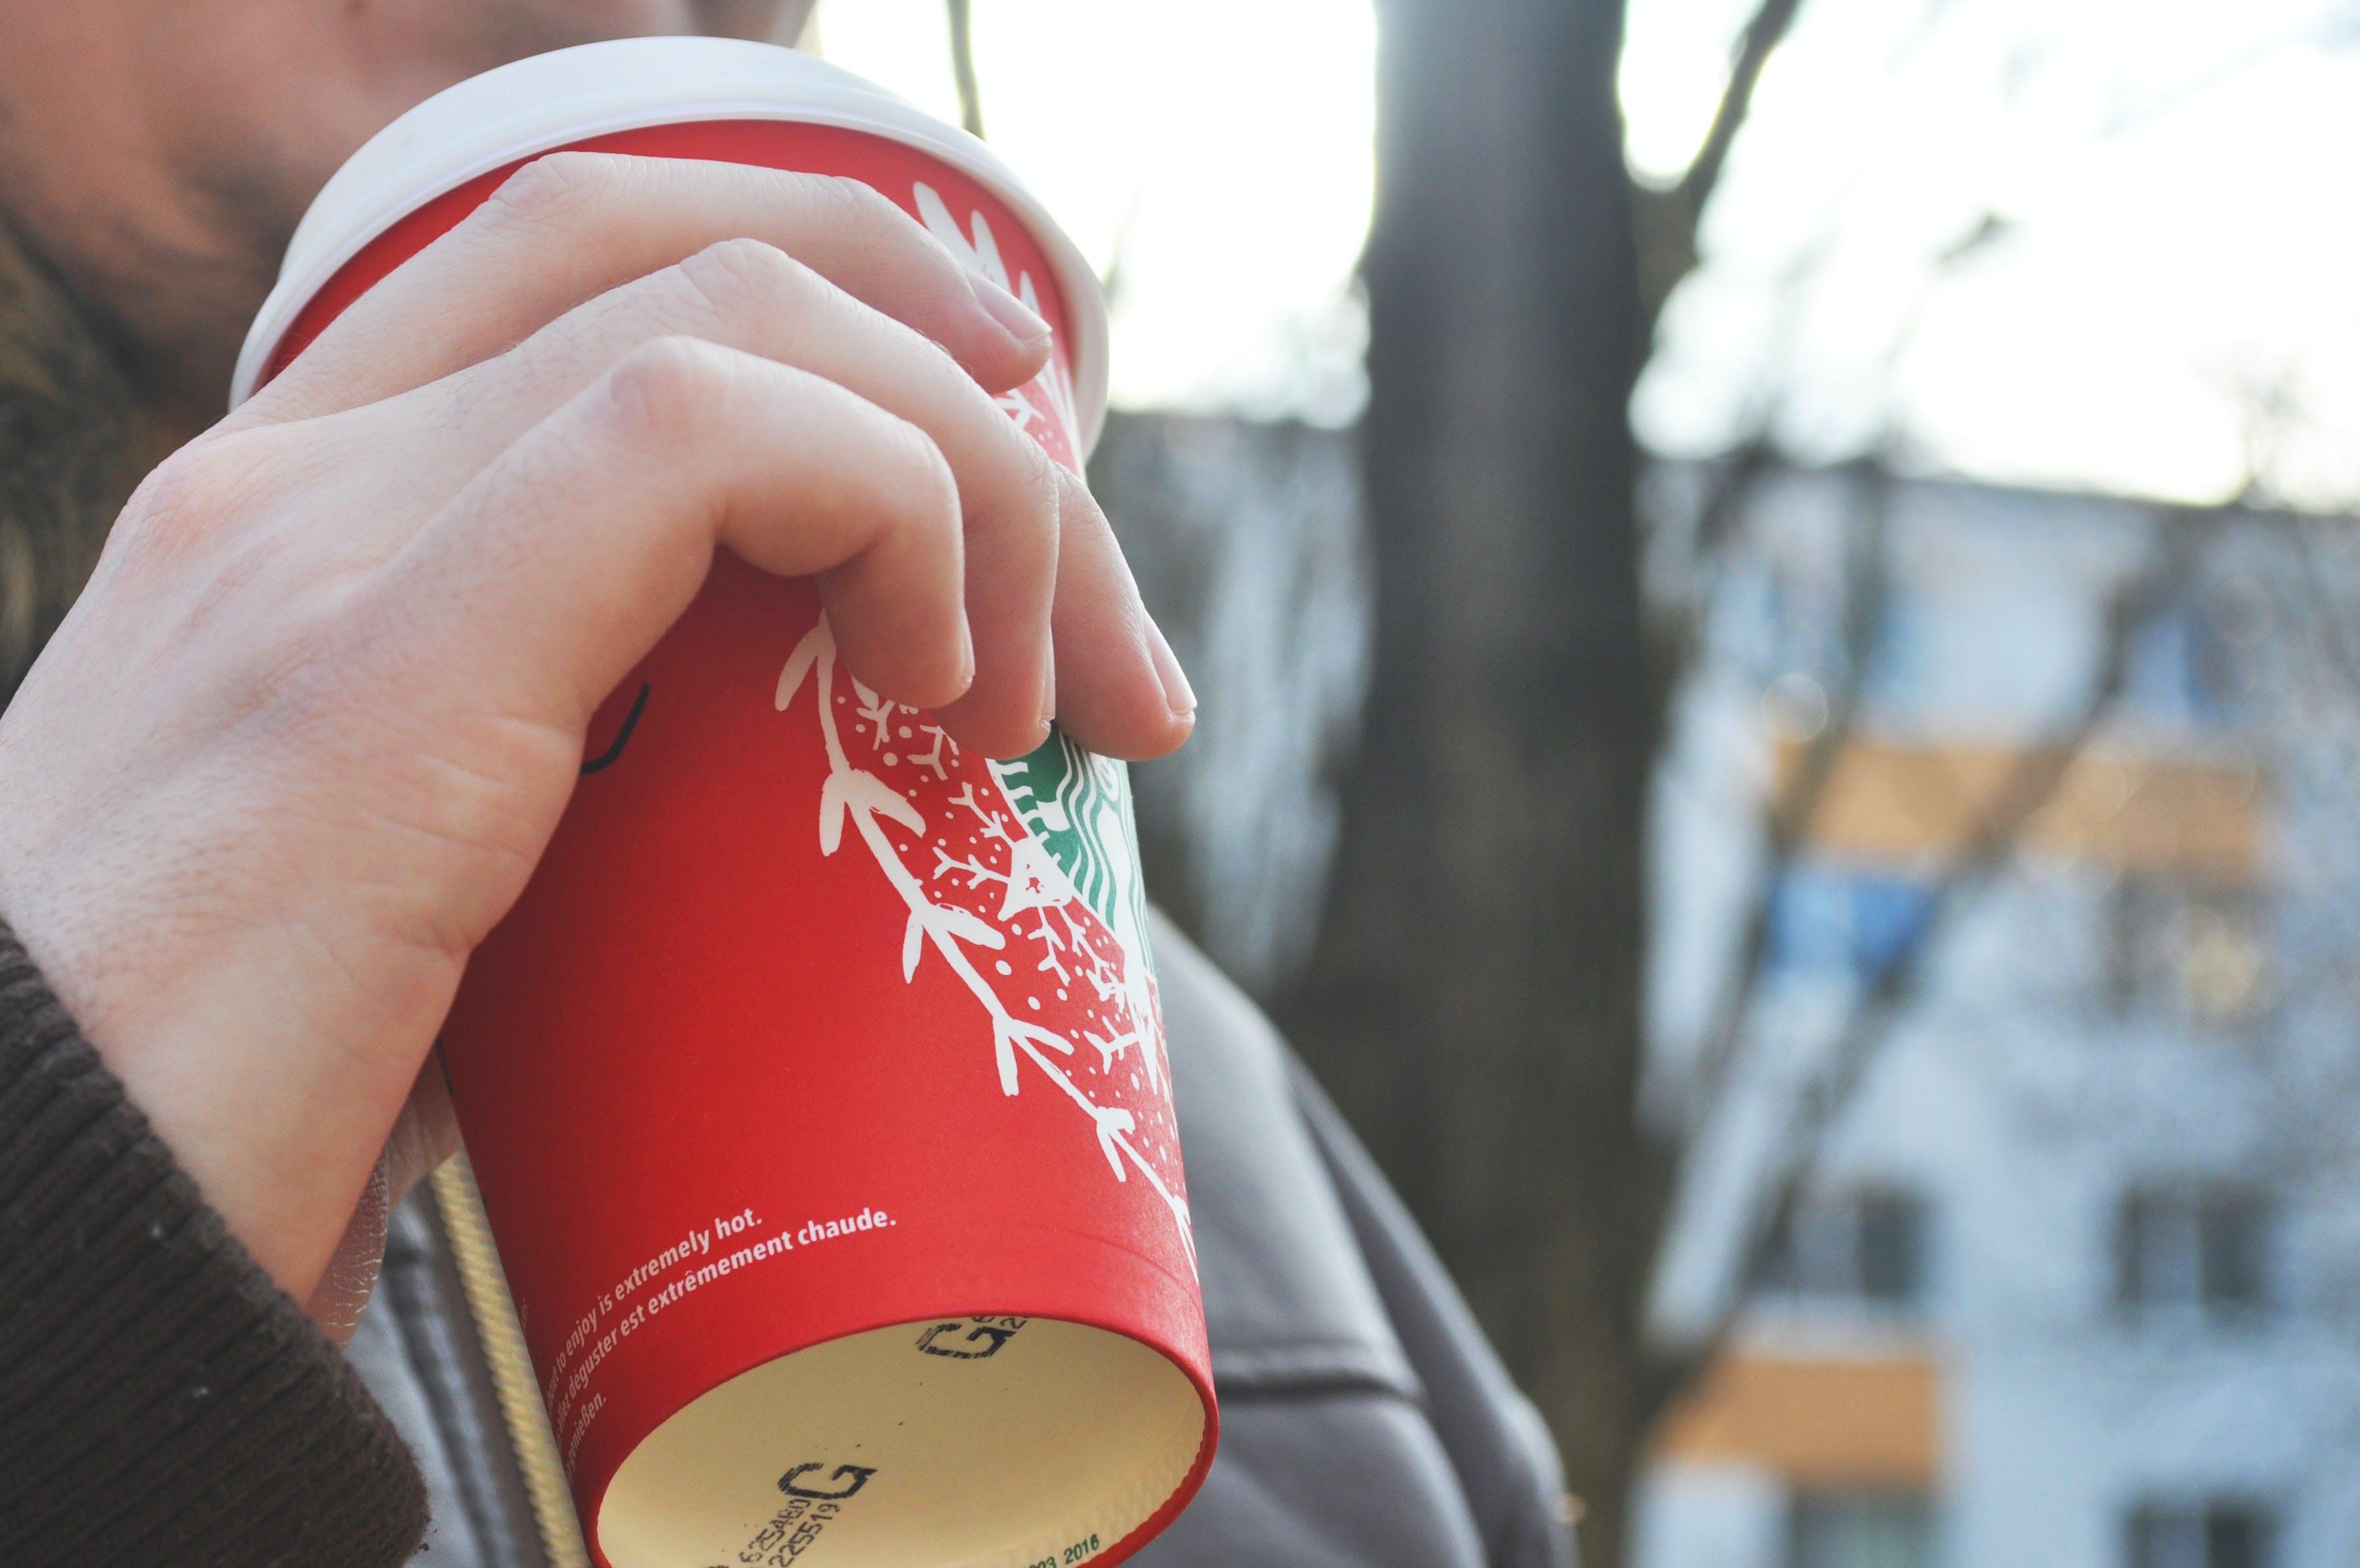 Immagine gratuita di bevanda calda, caffè, latte macchiato, mano